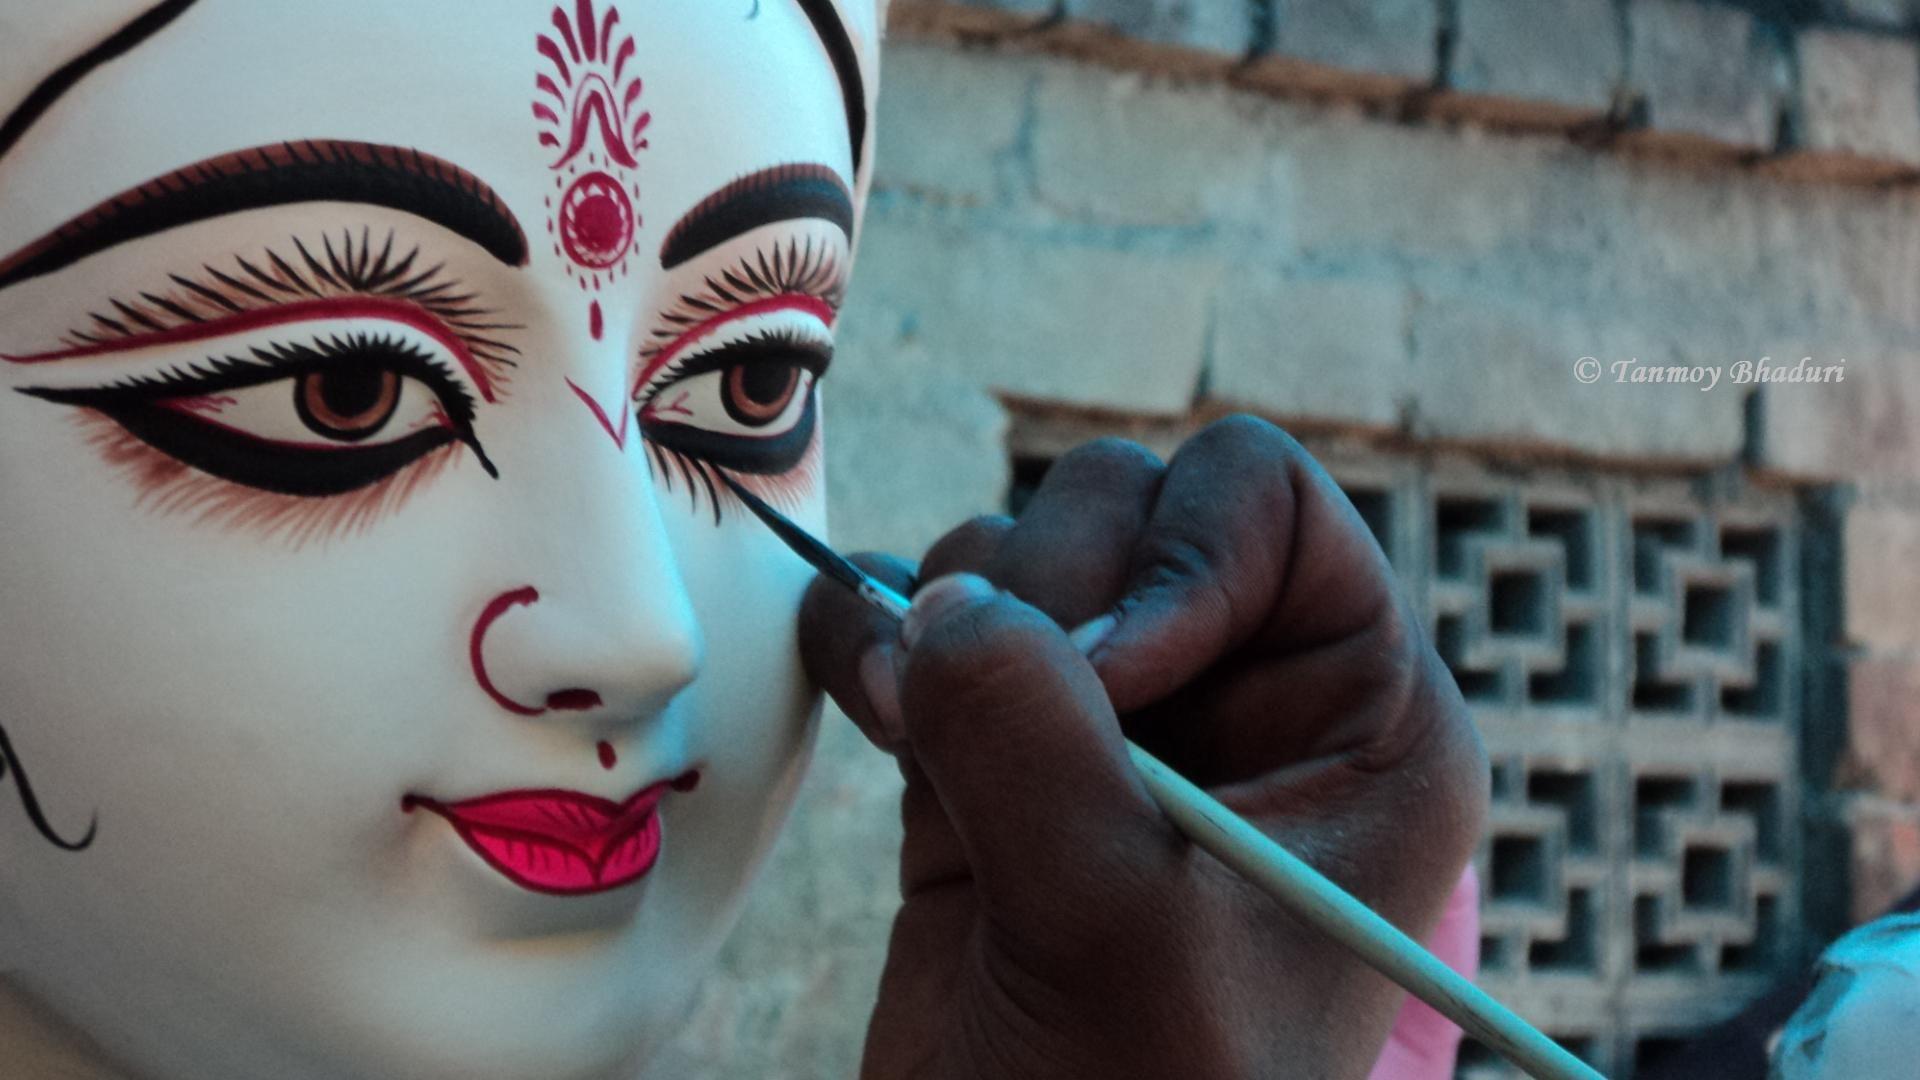 Chakkhudan Of Devi Saraswati India Hindu Goddess Durga Maa Durga Durga Puja